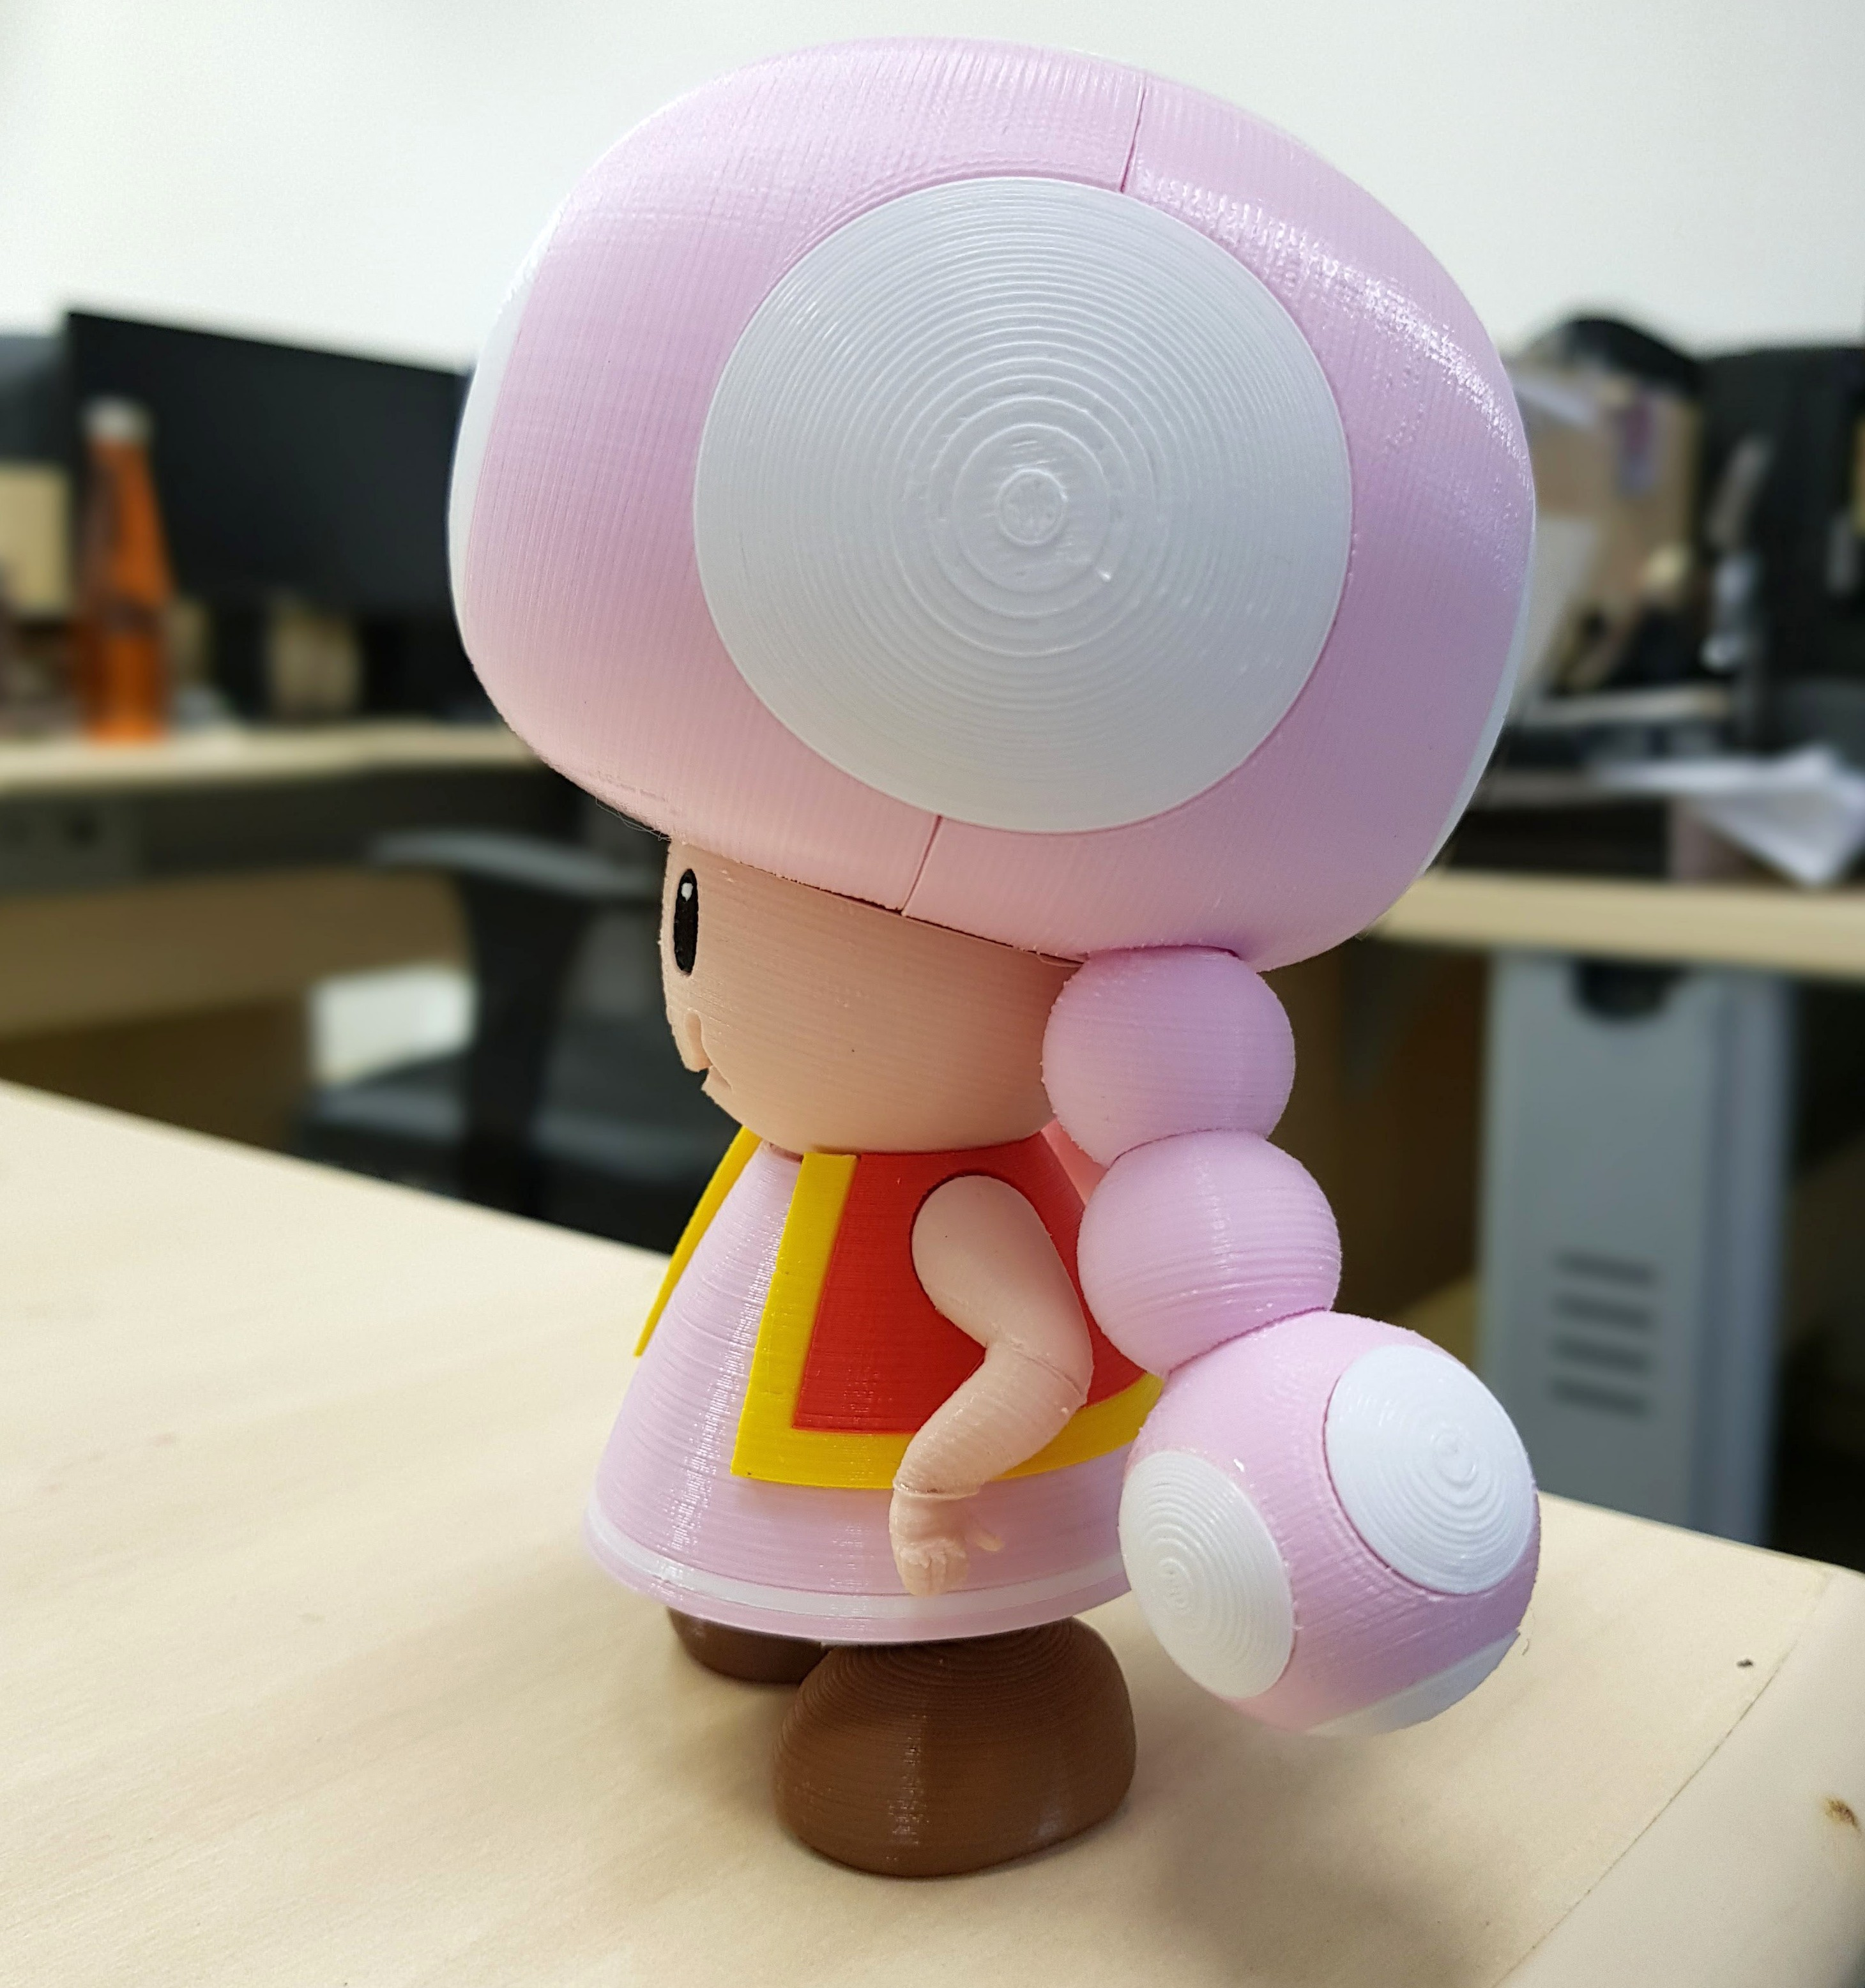 02.jpg Download free STL file Toadette from Mario games - Multi-color • 3D printing design, bpitanga